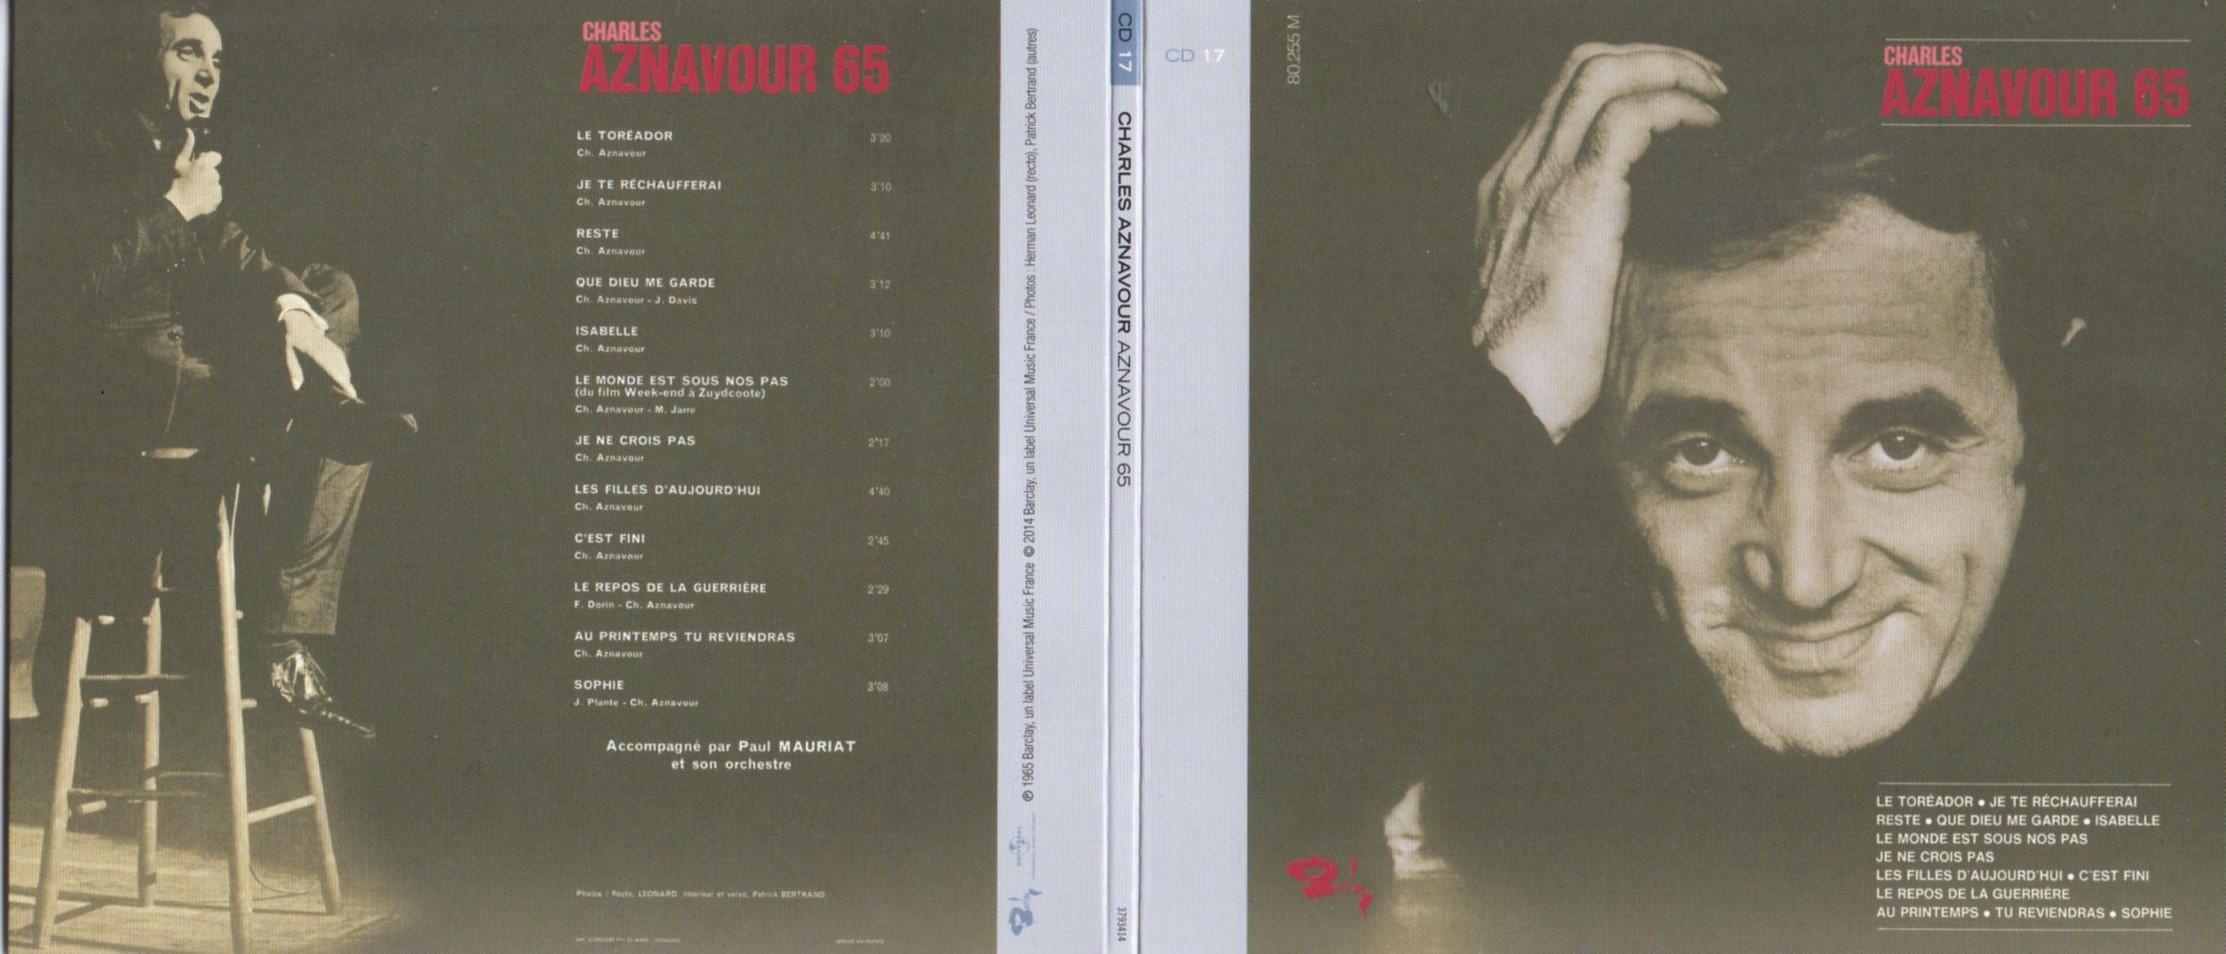 CHARLES AZNAVOUR - AZNAVOUR 65 (1965) Gatefold Card board sleeve Replica - CD